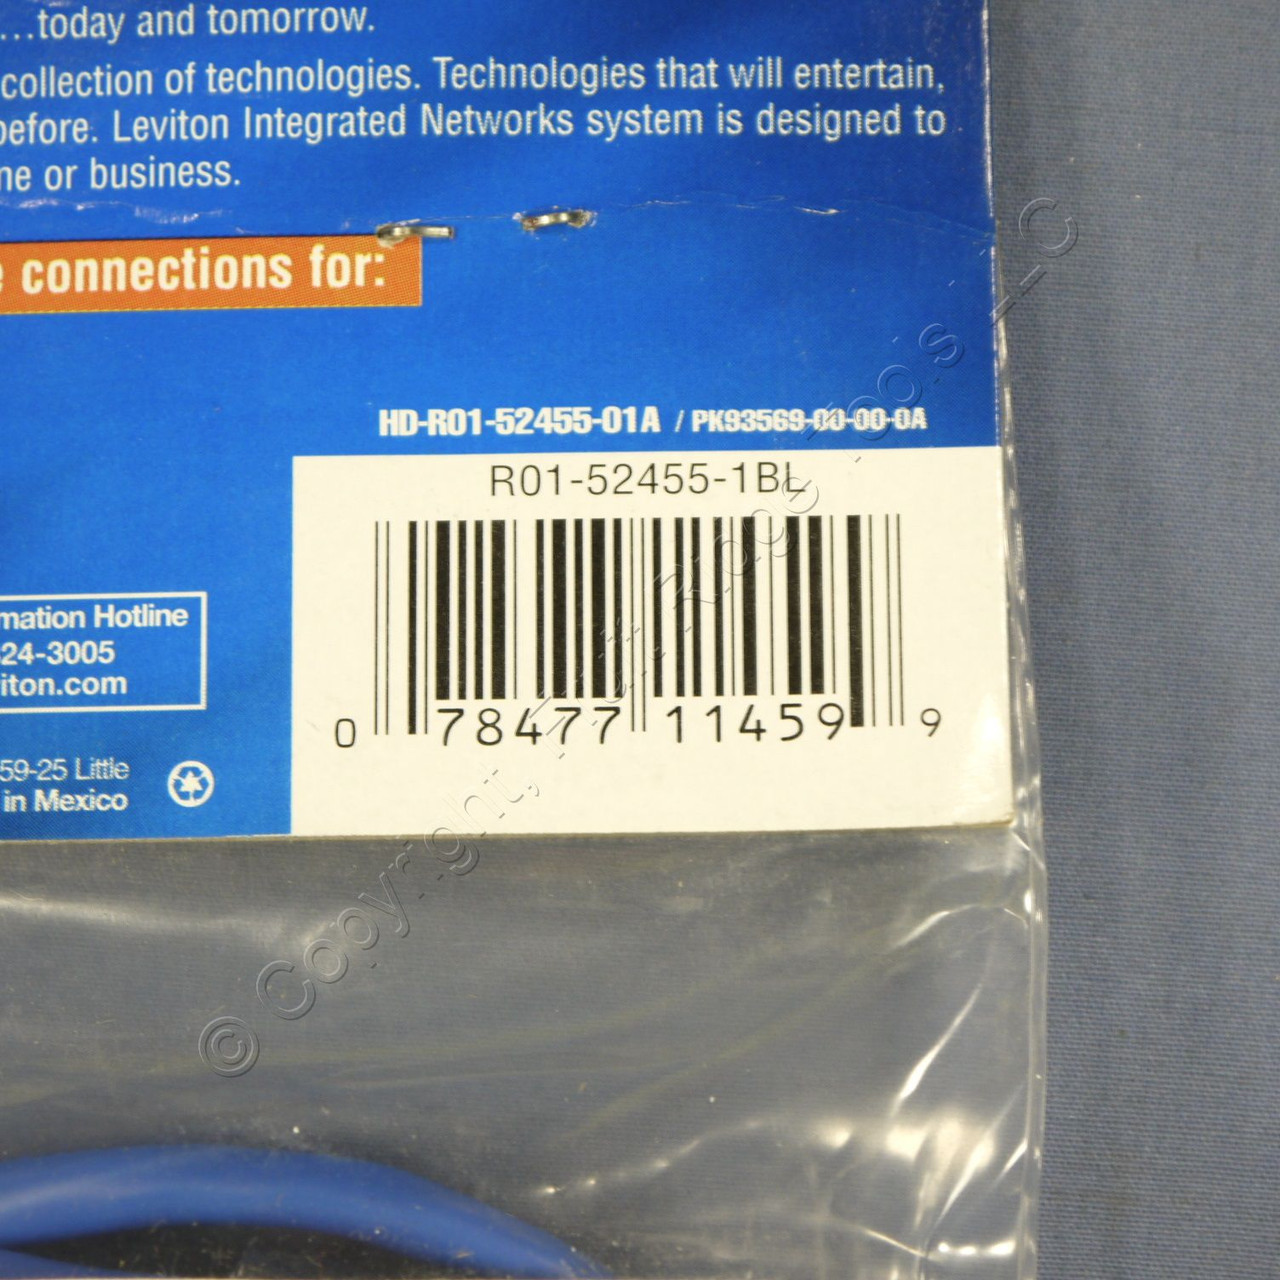 5 Blue Leviton Cat 5 1-Foot Ethernet LAN Patch Cords Network Cables 52455-1BL